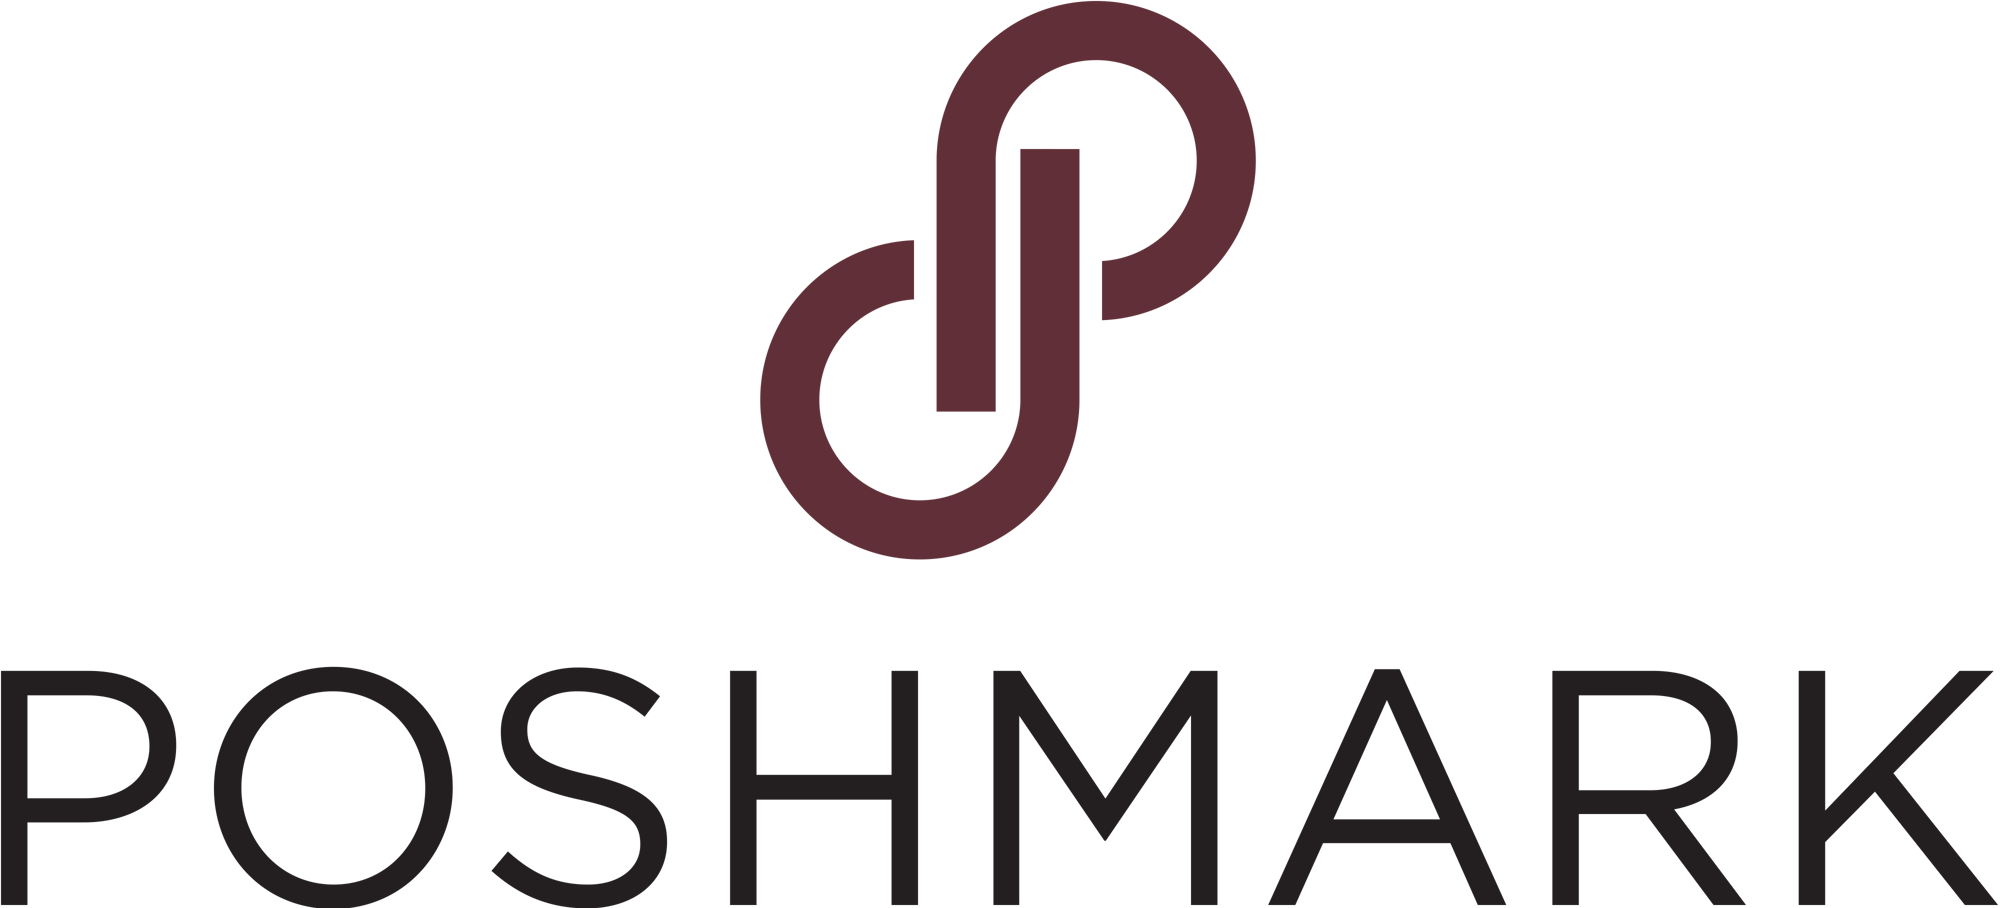 Poshmark POSH stock IPO